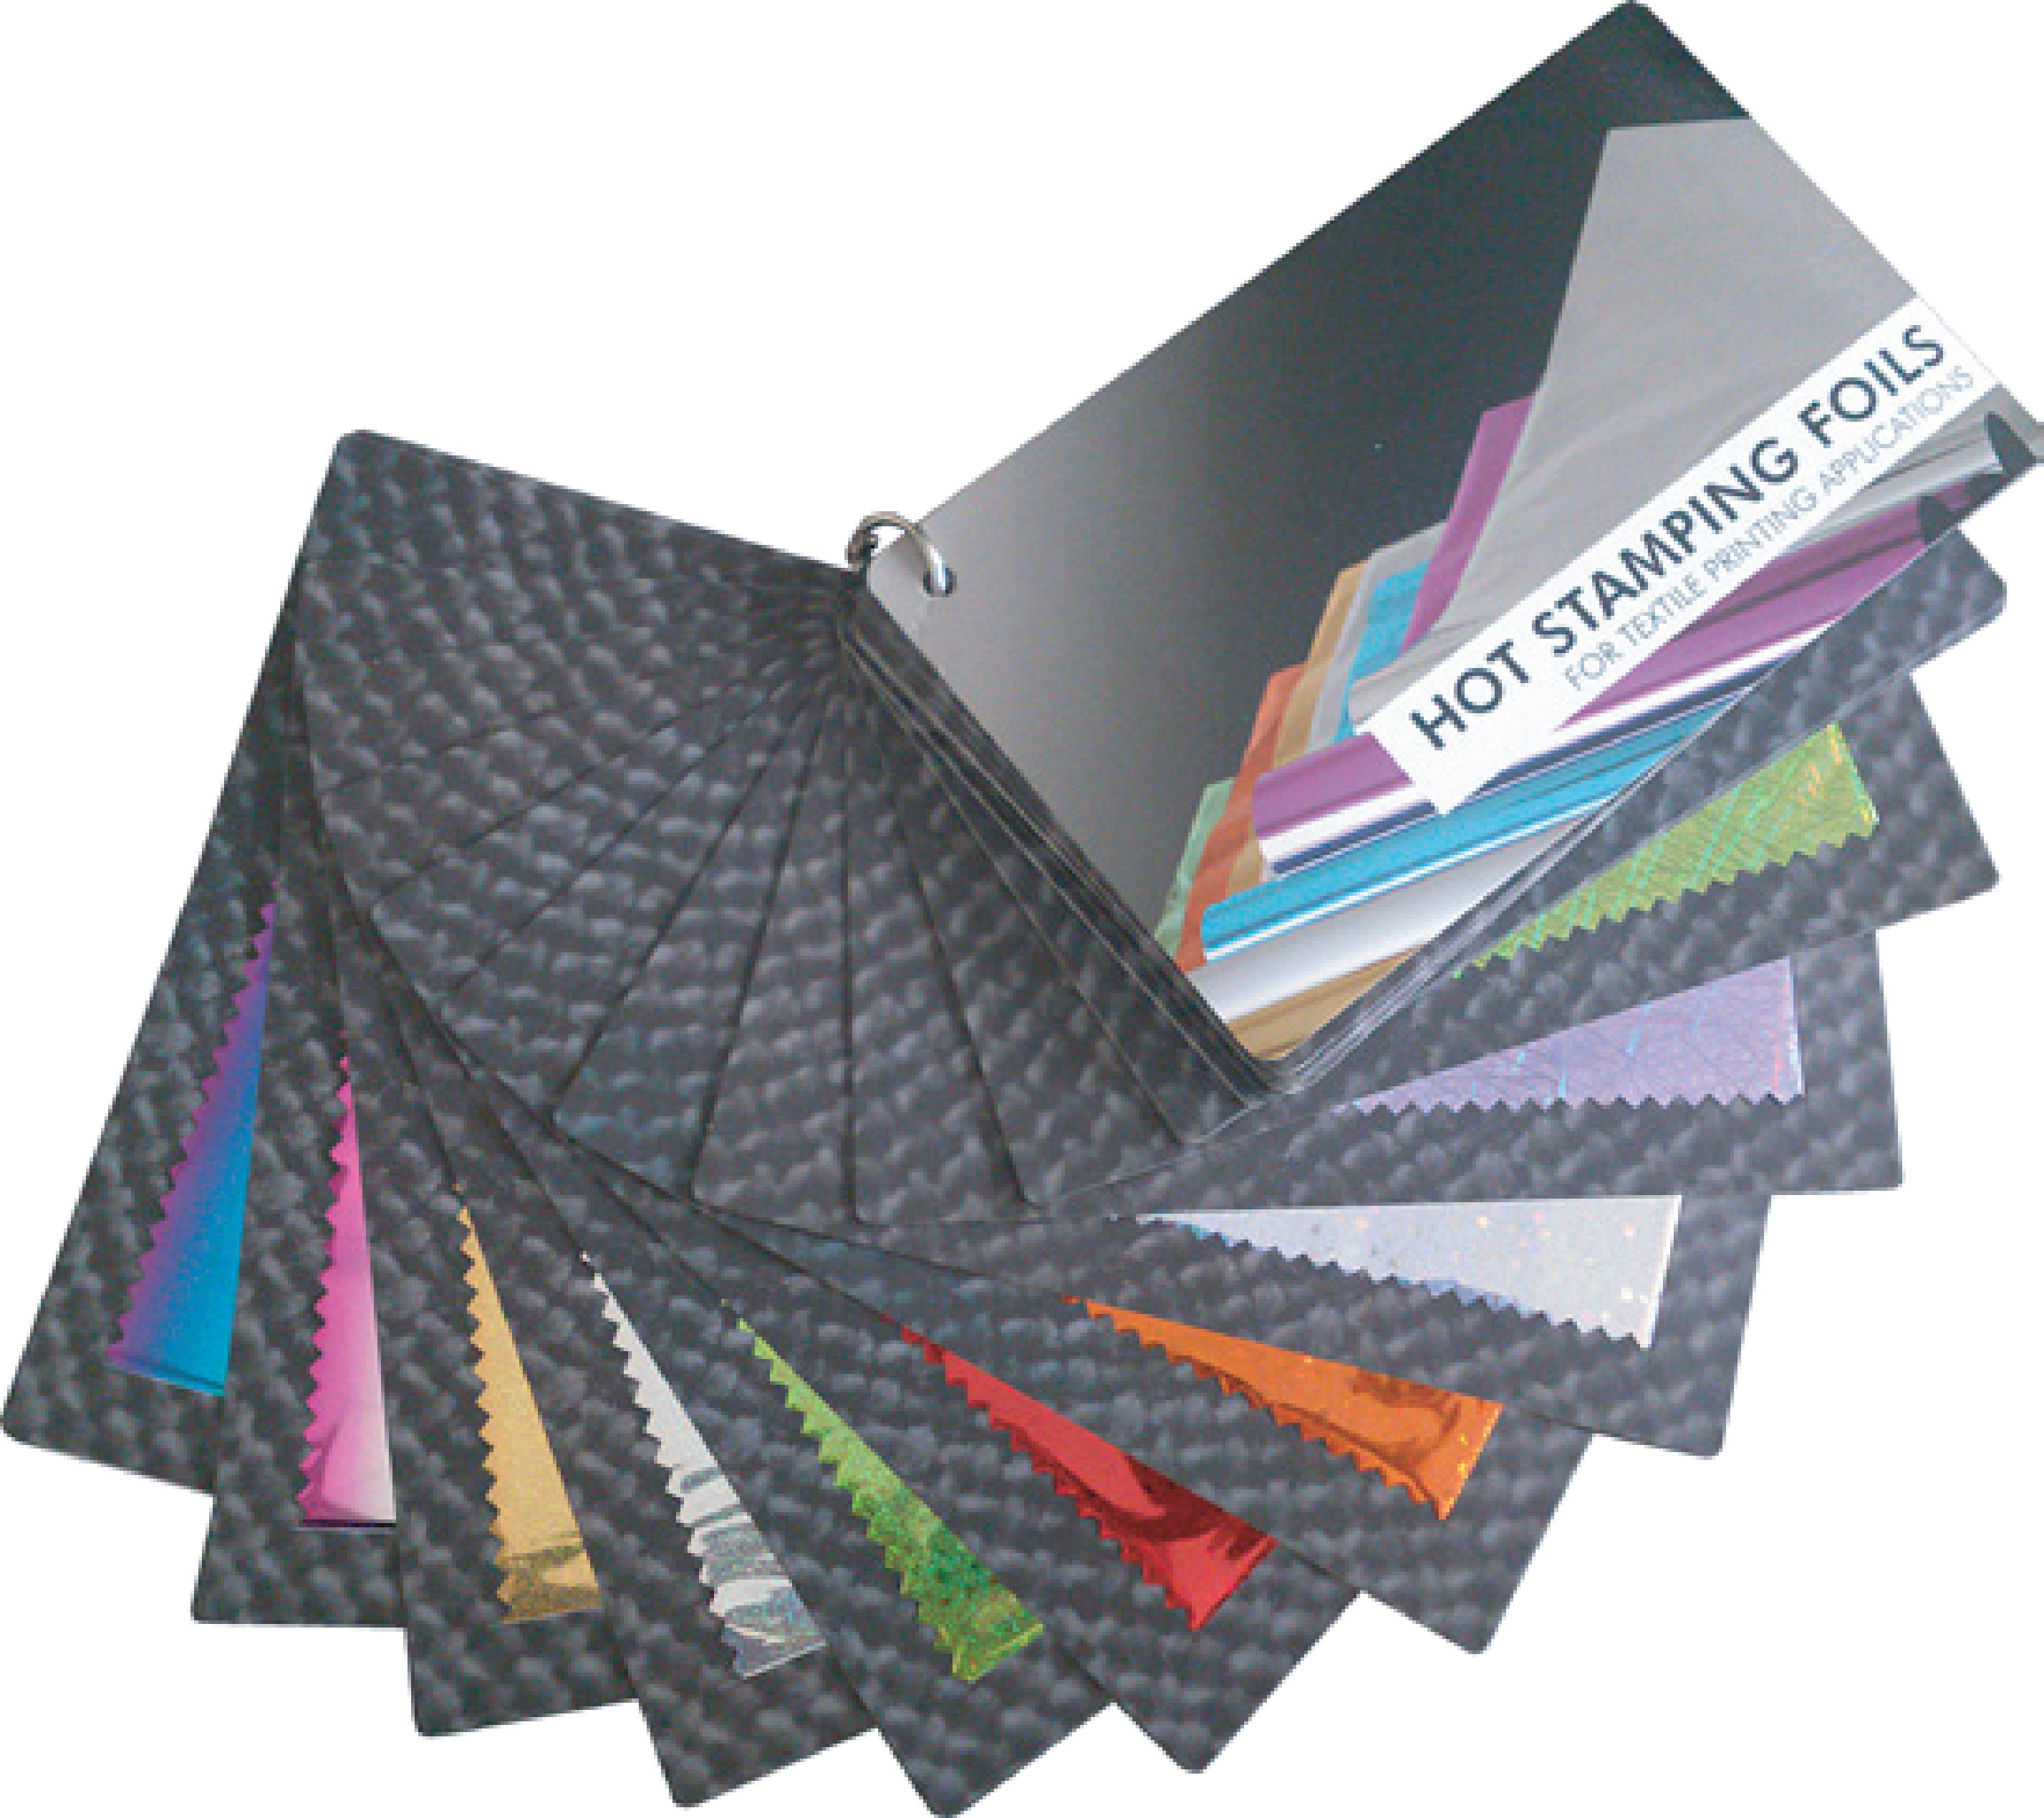 Forever Hot Stamping Foils Swatch cards on transparent background